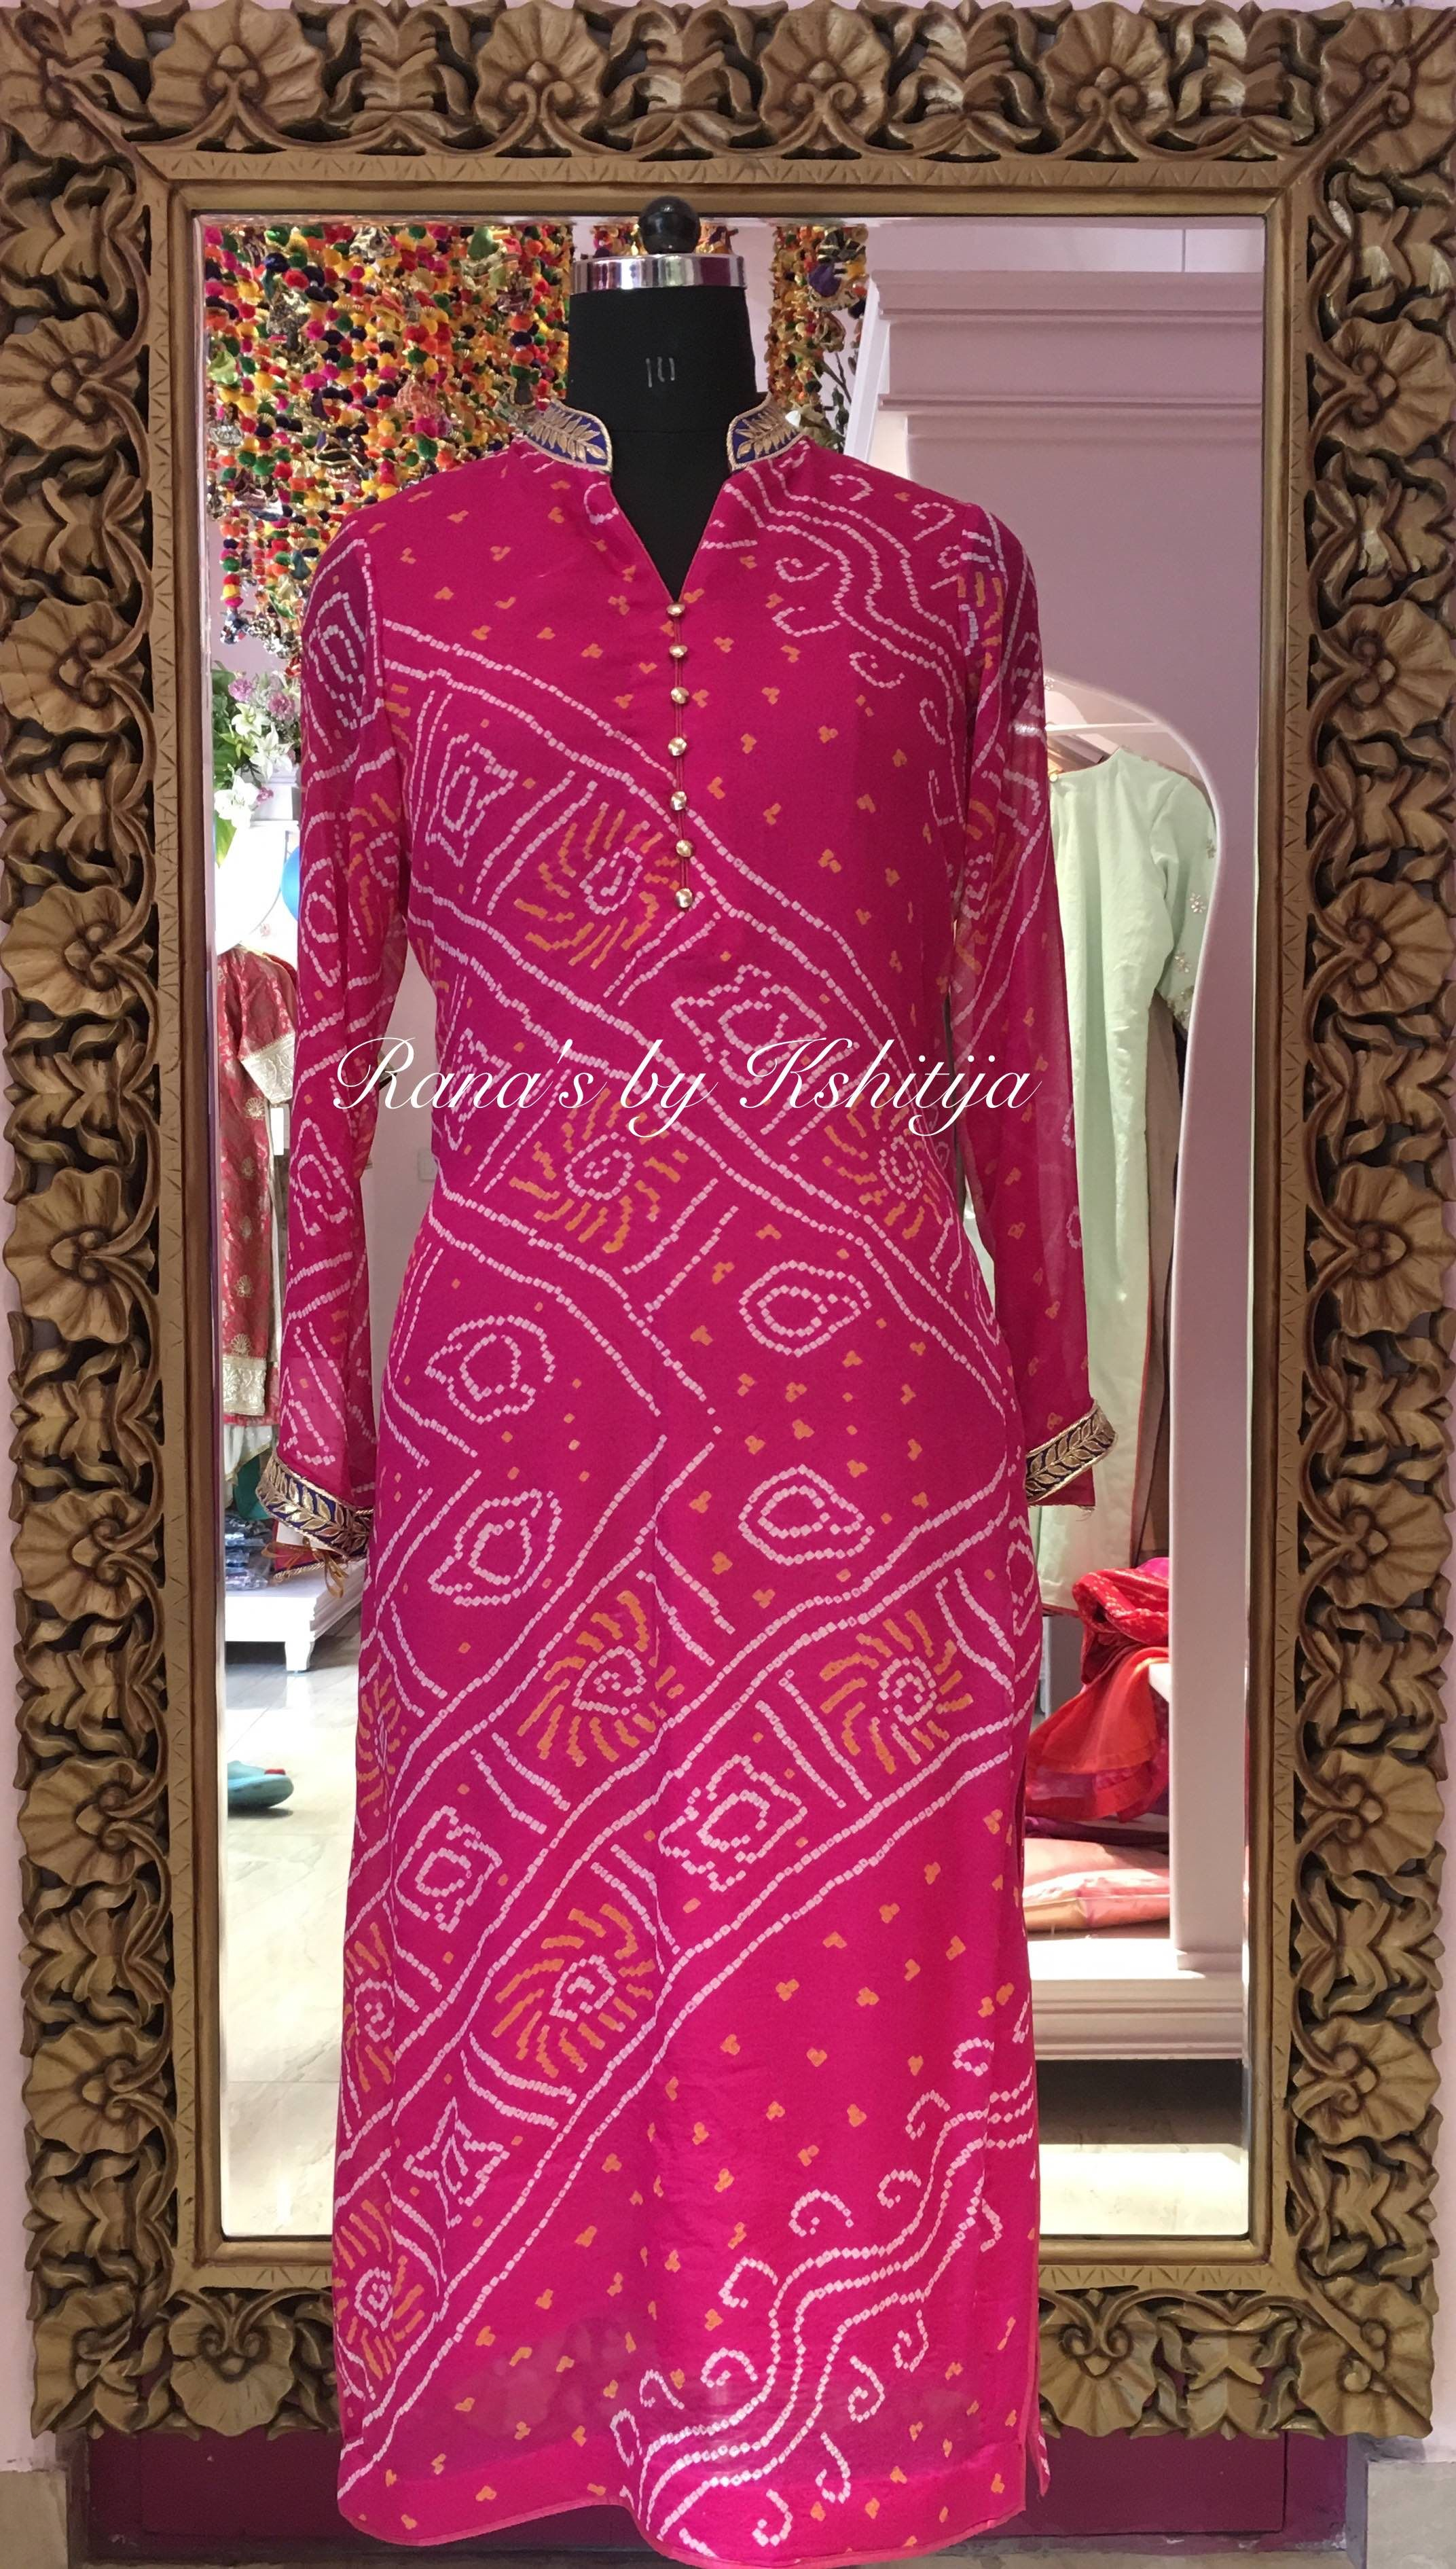 Bandhani Kurti Rani Pink In Pure Georgette Rana S By Kshitija In 2020 Long Kurti Designs Bandhani Dress Kurta Designs